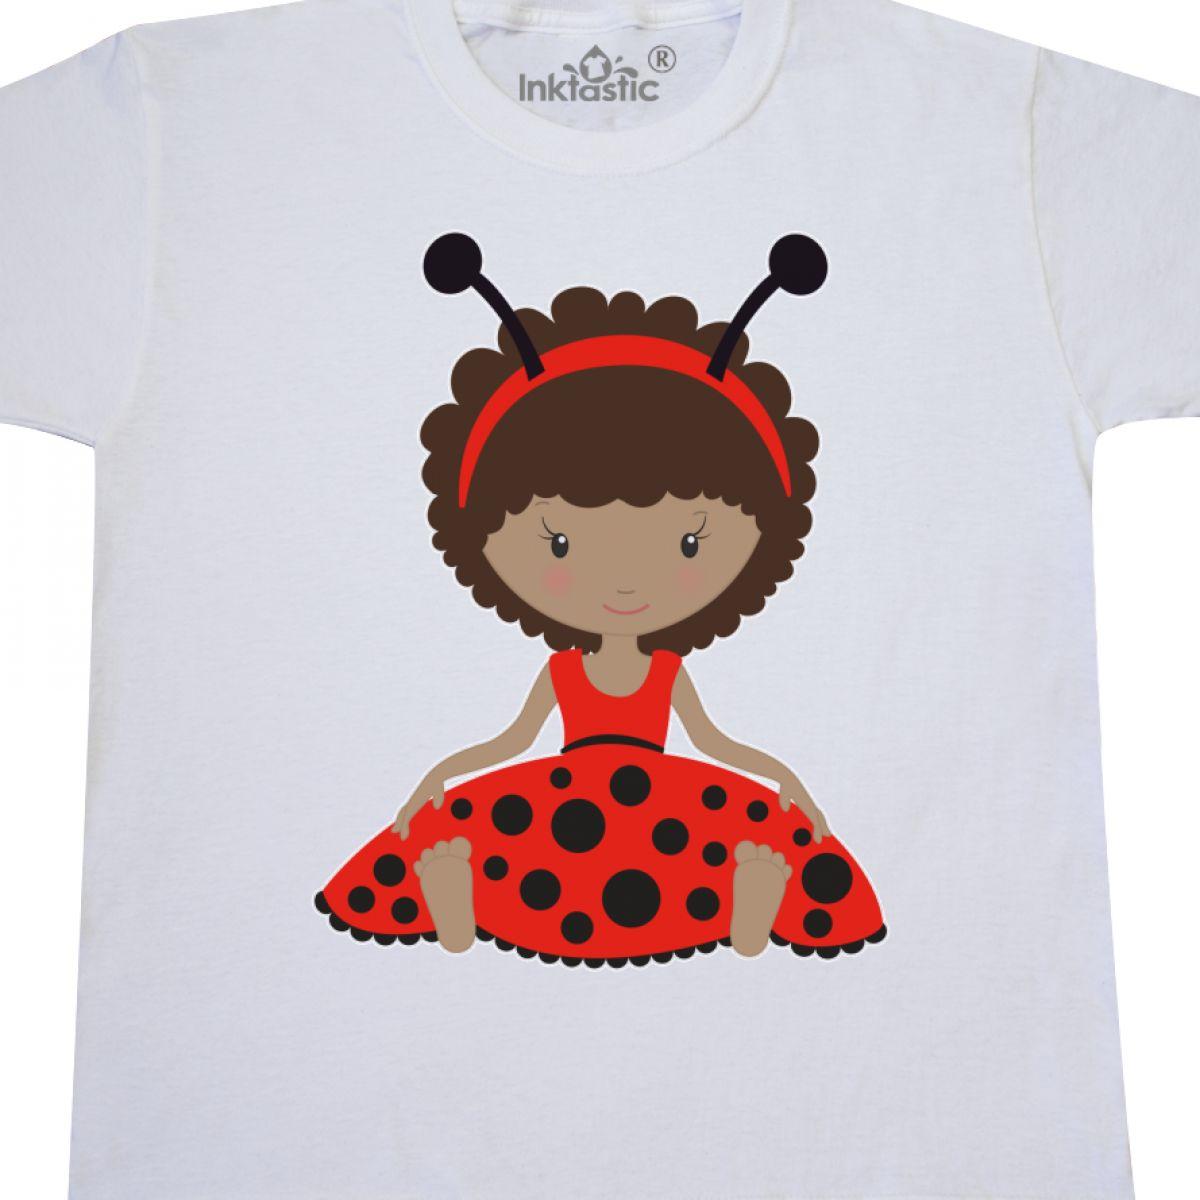 Inktastic-Ethnic-Ladybug-Girl-In-Red-Dress-Youth-T-Shirt-Antennas-Tee-Kids-Child